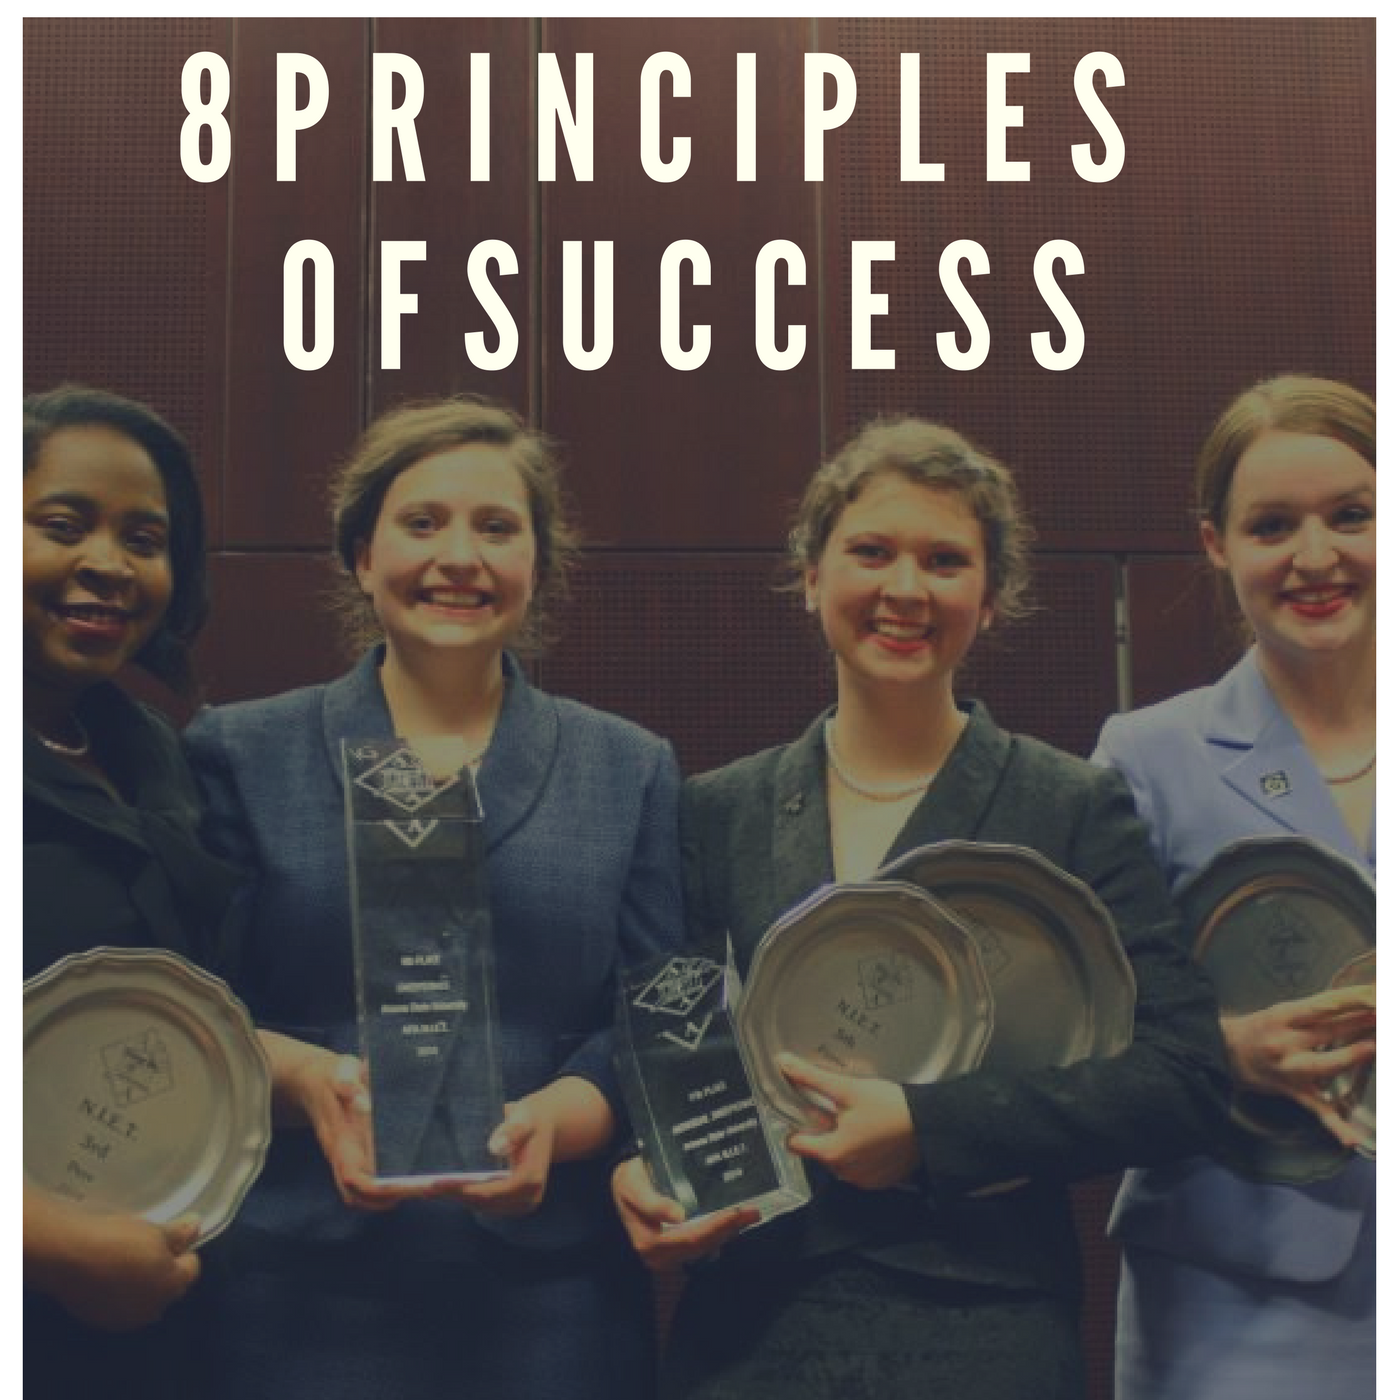 8 Principles of Success .png